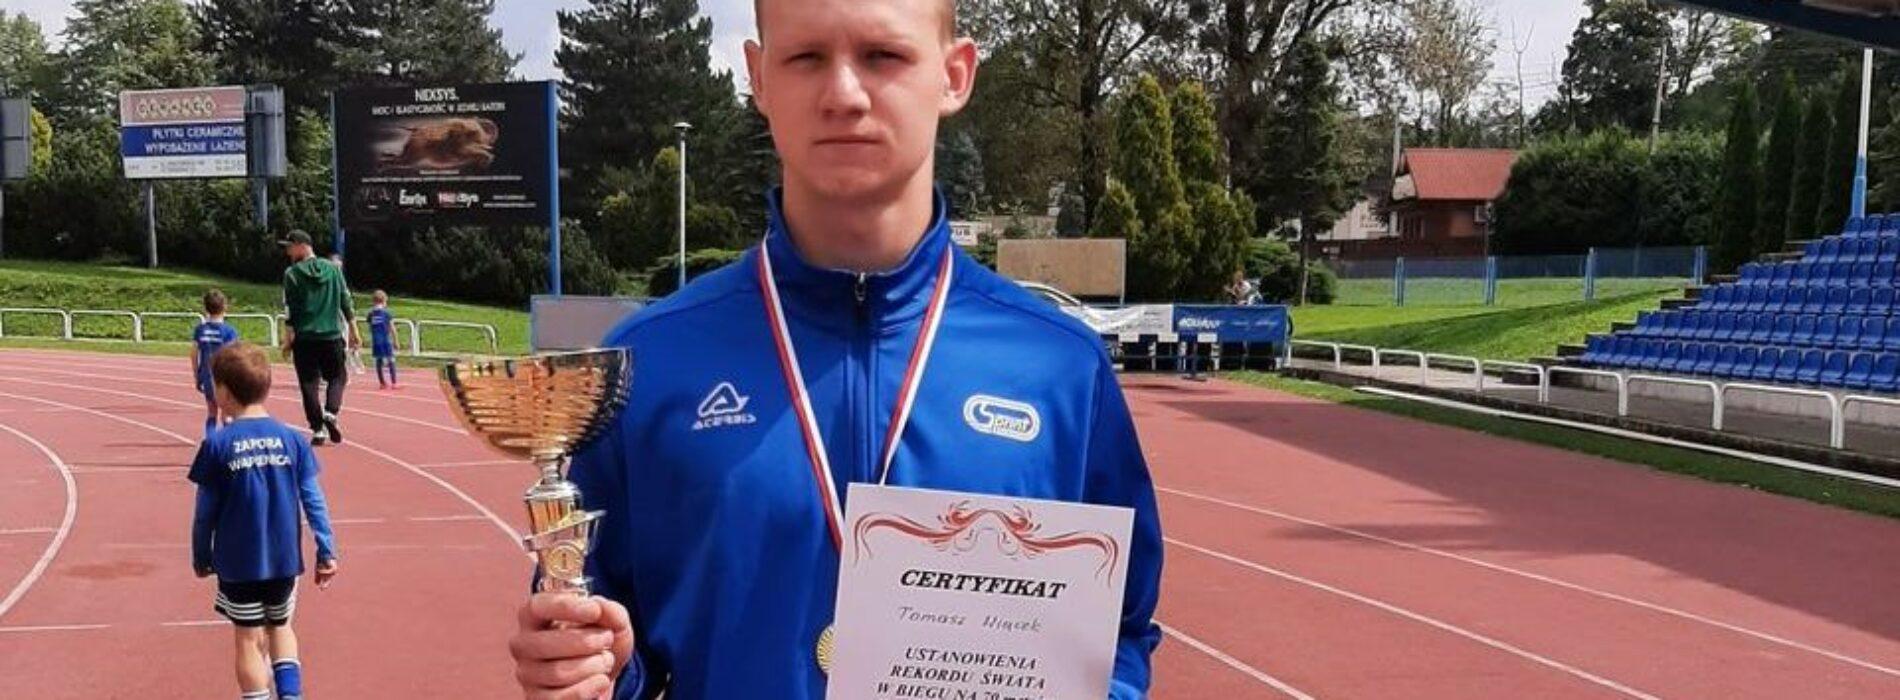 Mistrzostwa Bielska-Białej w biegu na 70 m